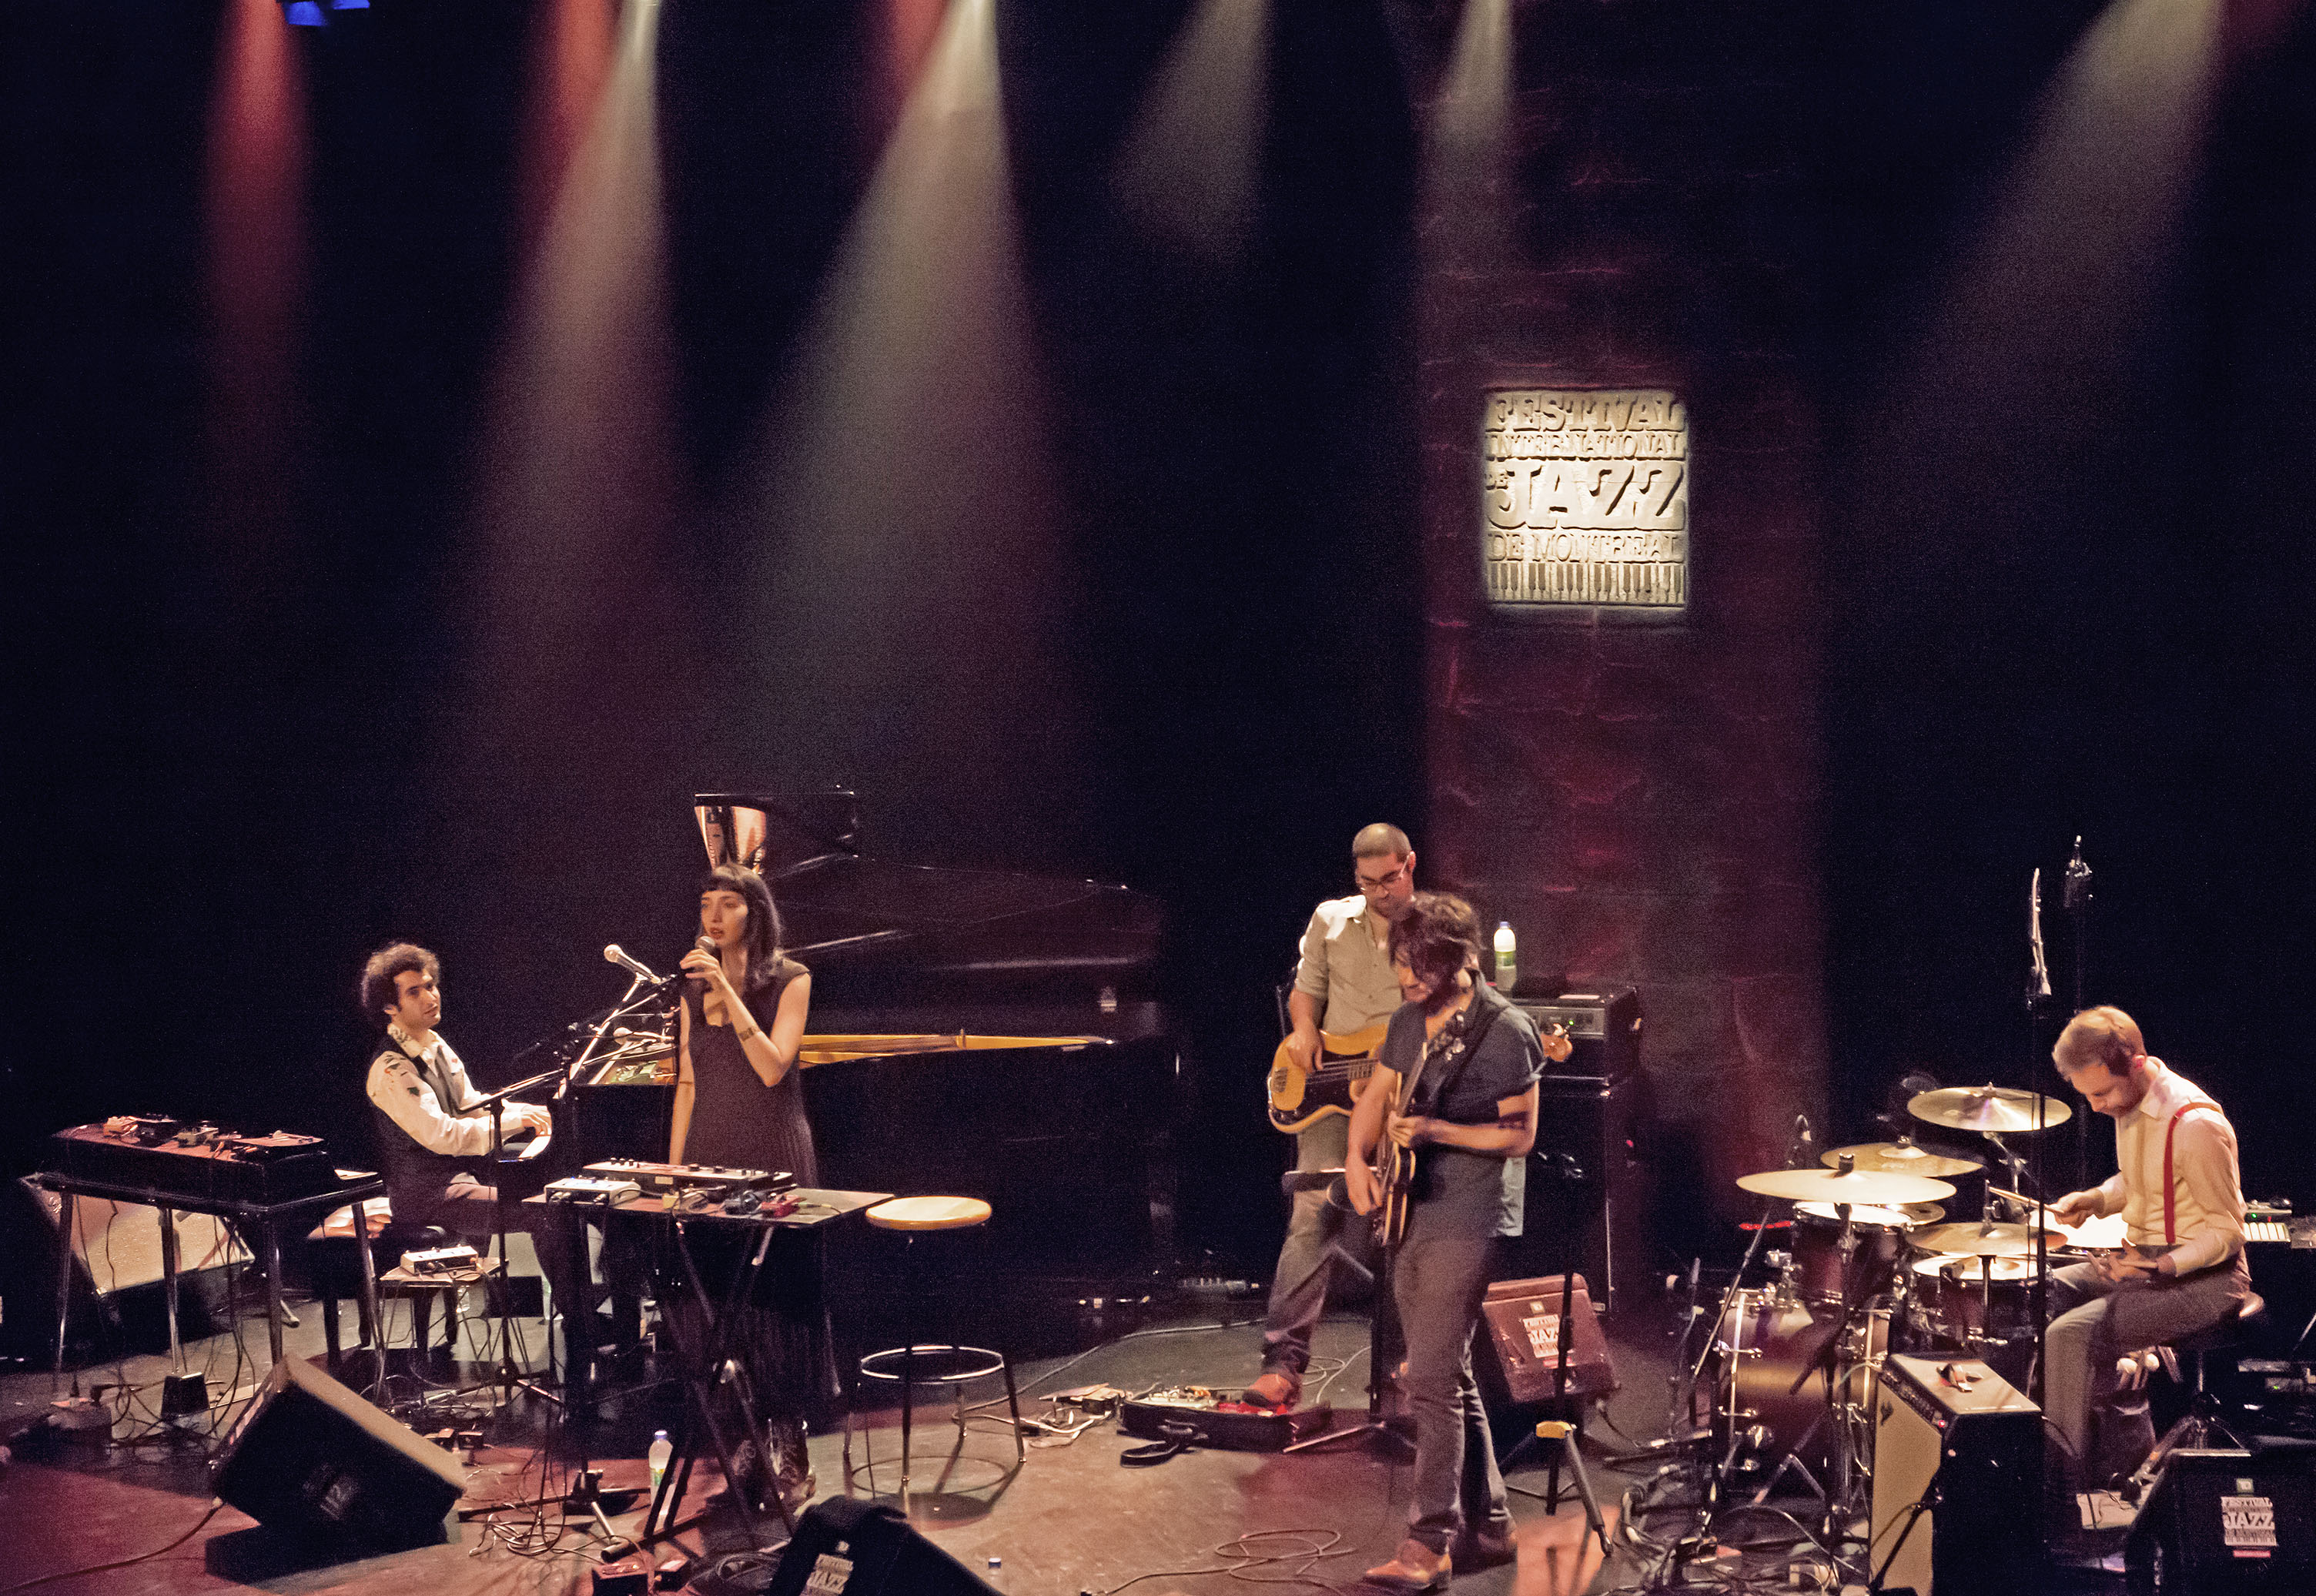 Tigran Shadow Theater at 2014 Festival International de Jazz de Montréal